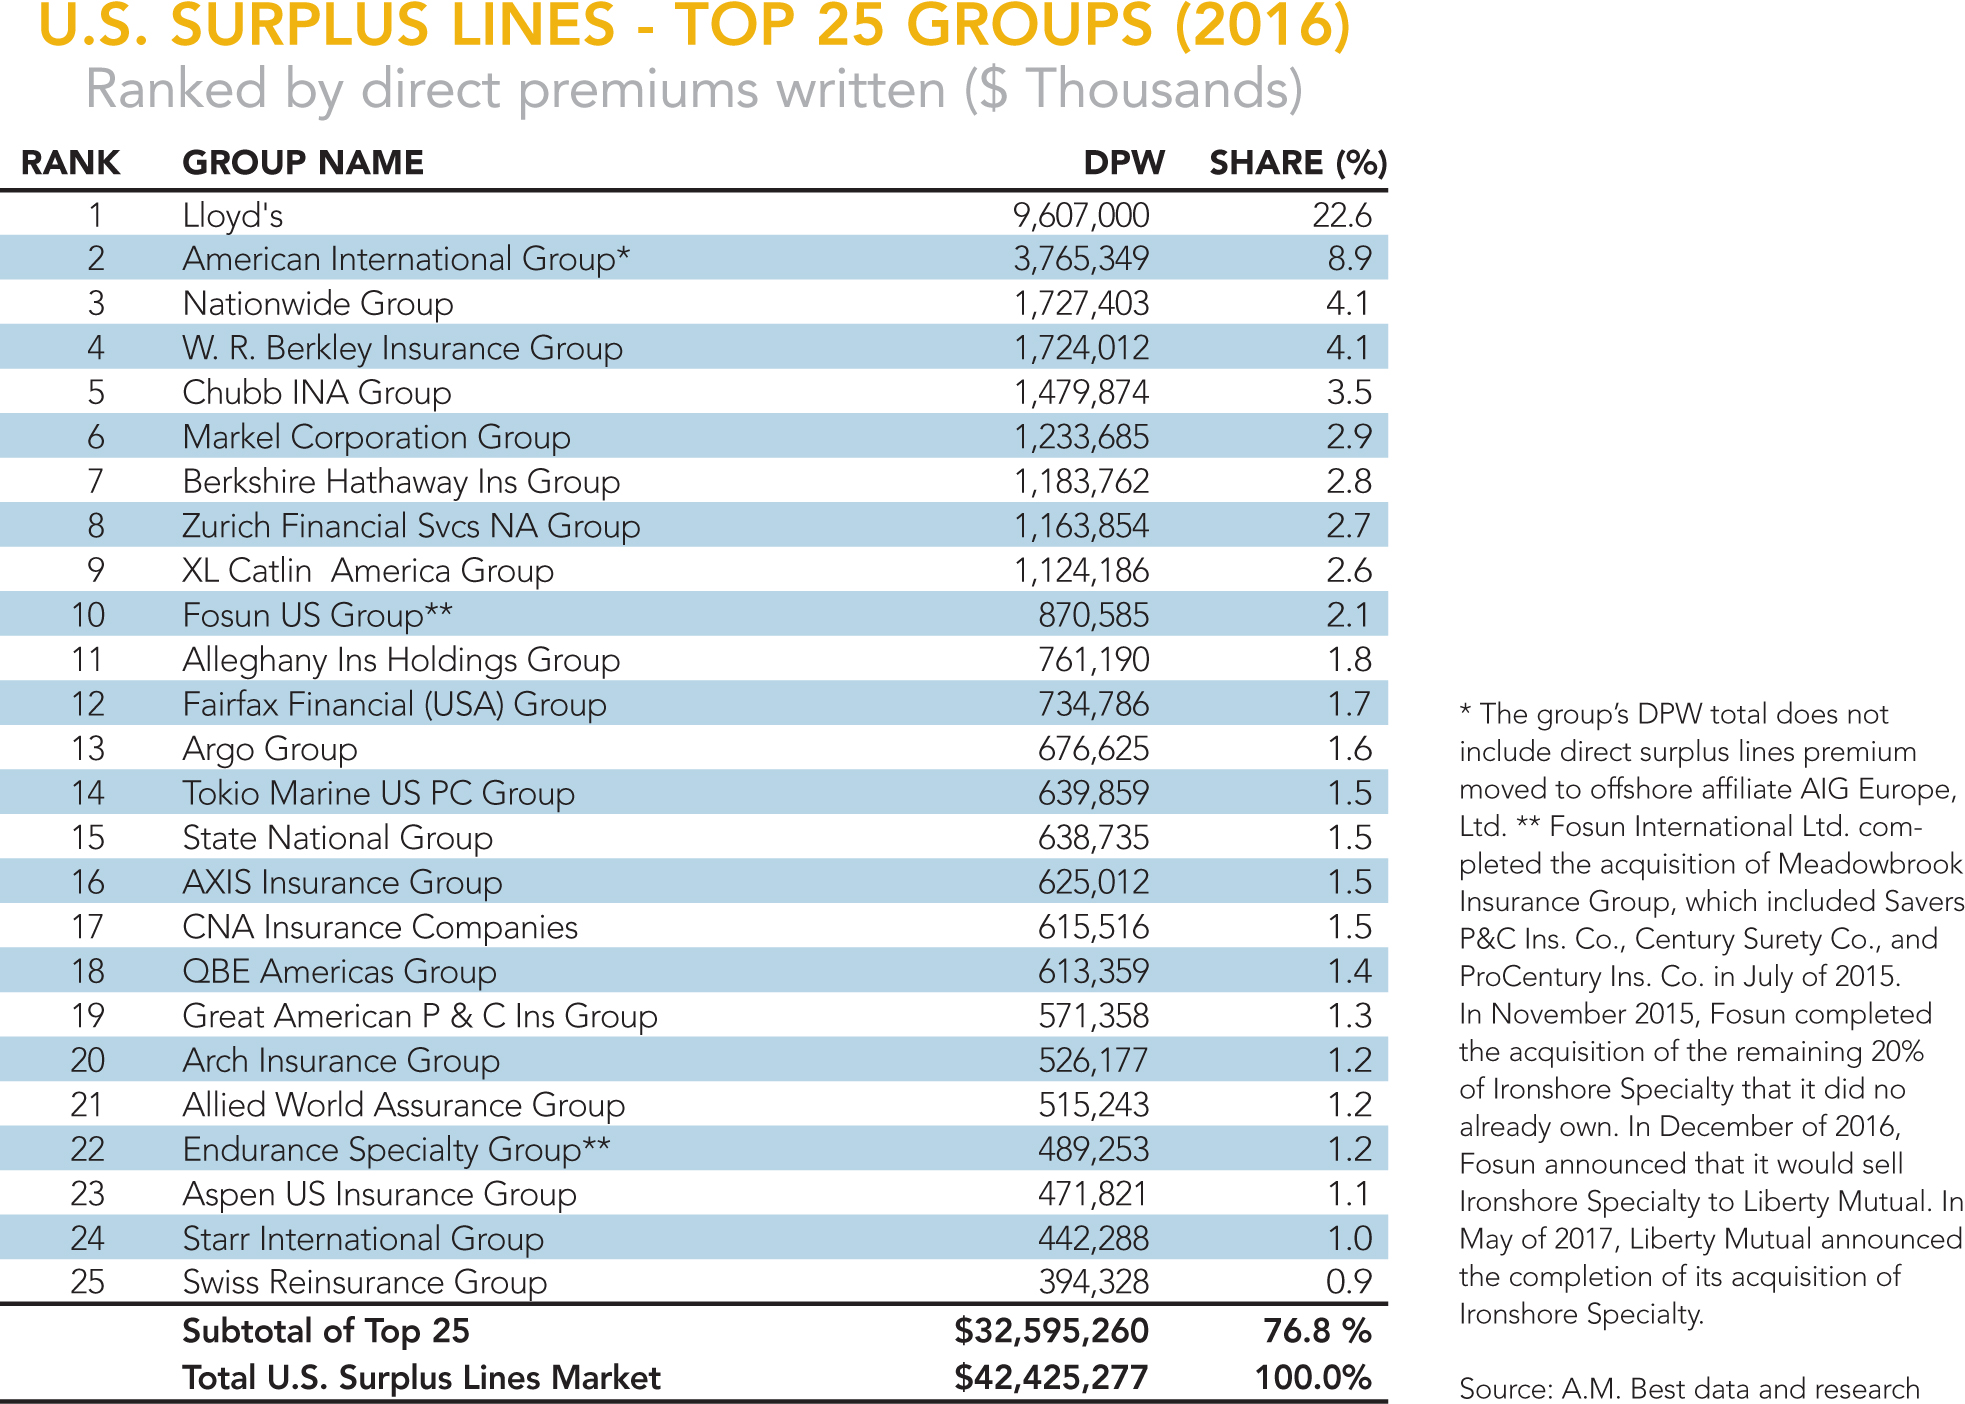 Best's U.S. surplus lines groups